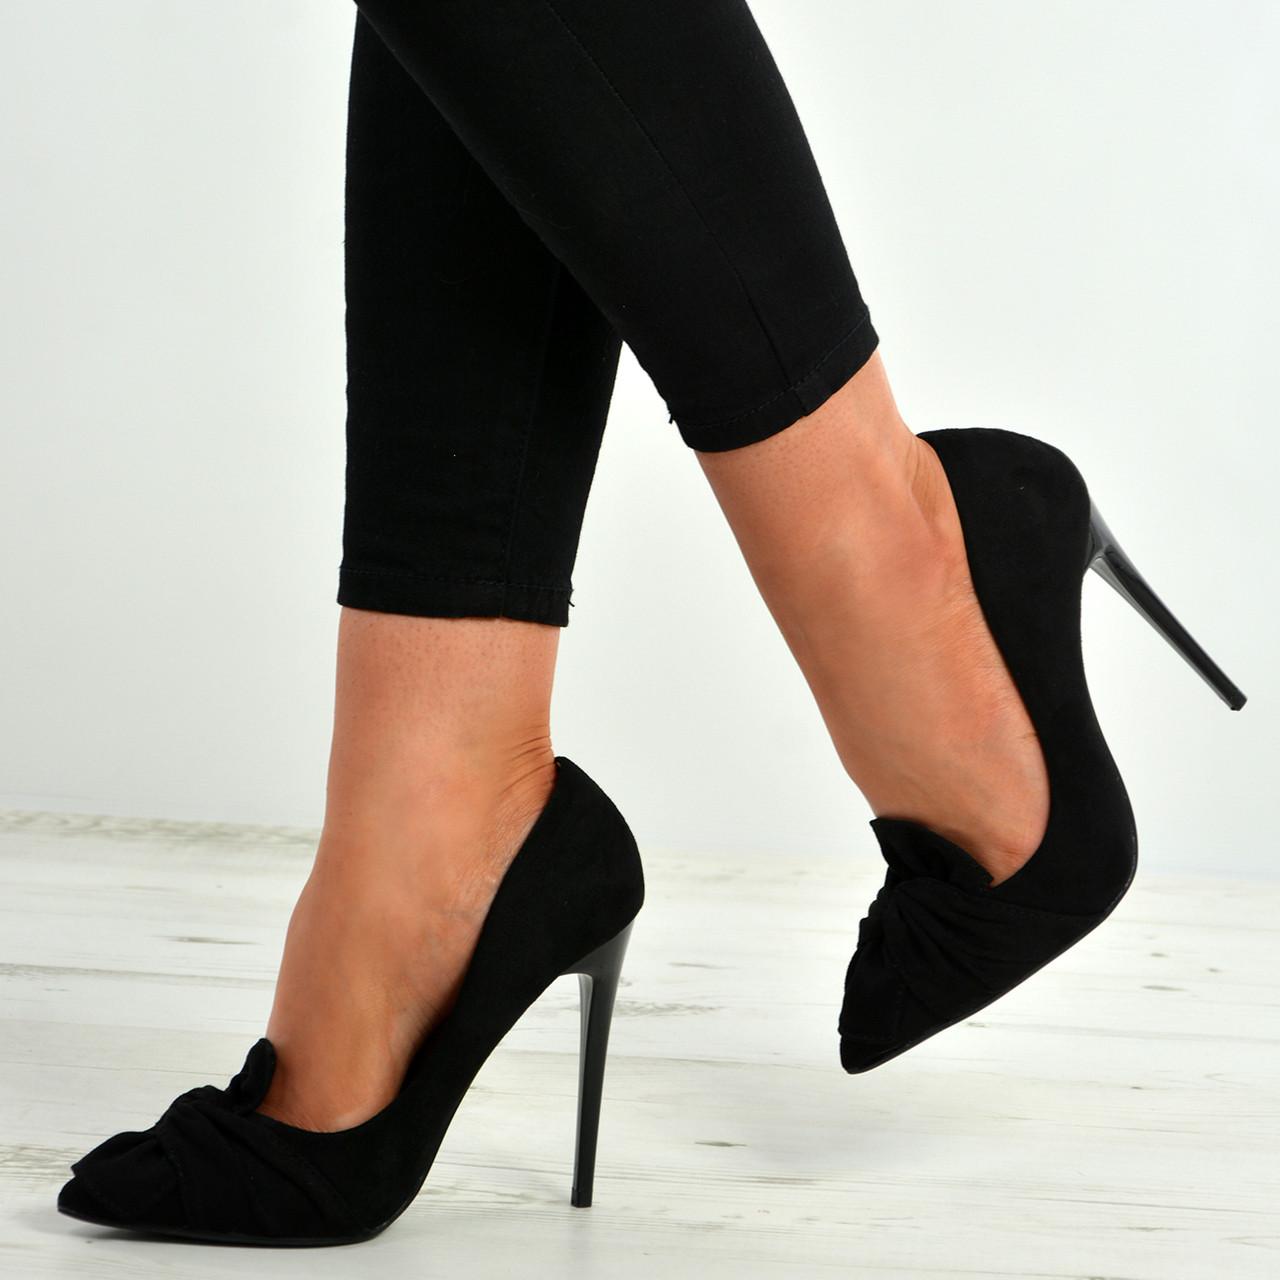 2d2859e5ac922 New Womens Ladies Bow High Stiletto Heel Court Pumps Shoes Size Uk 3-8